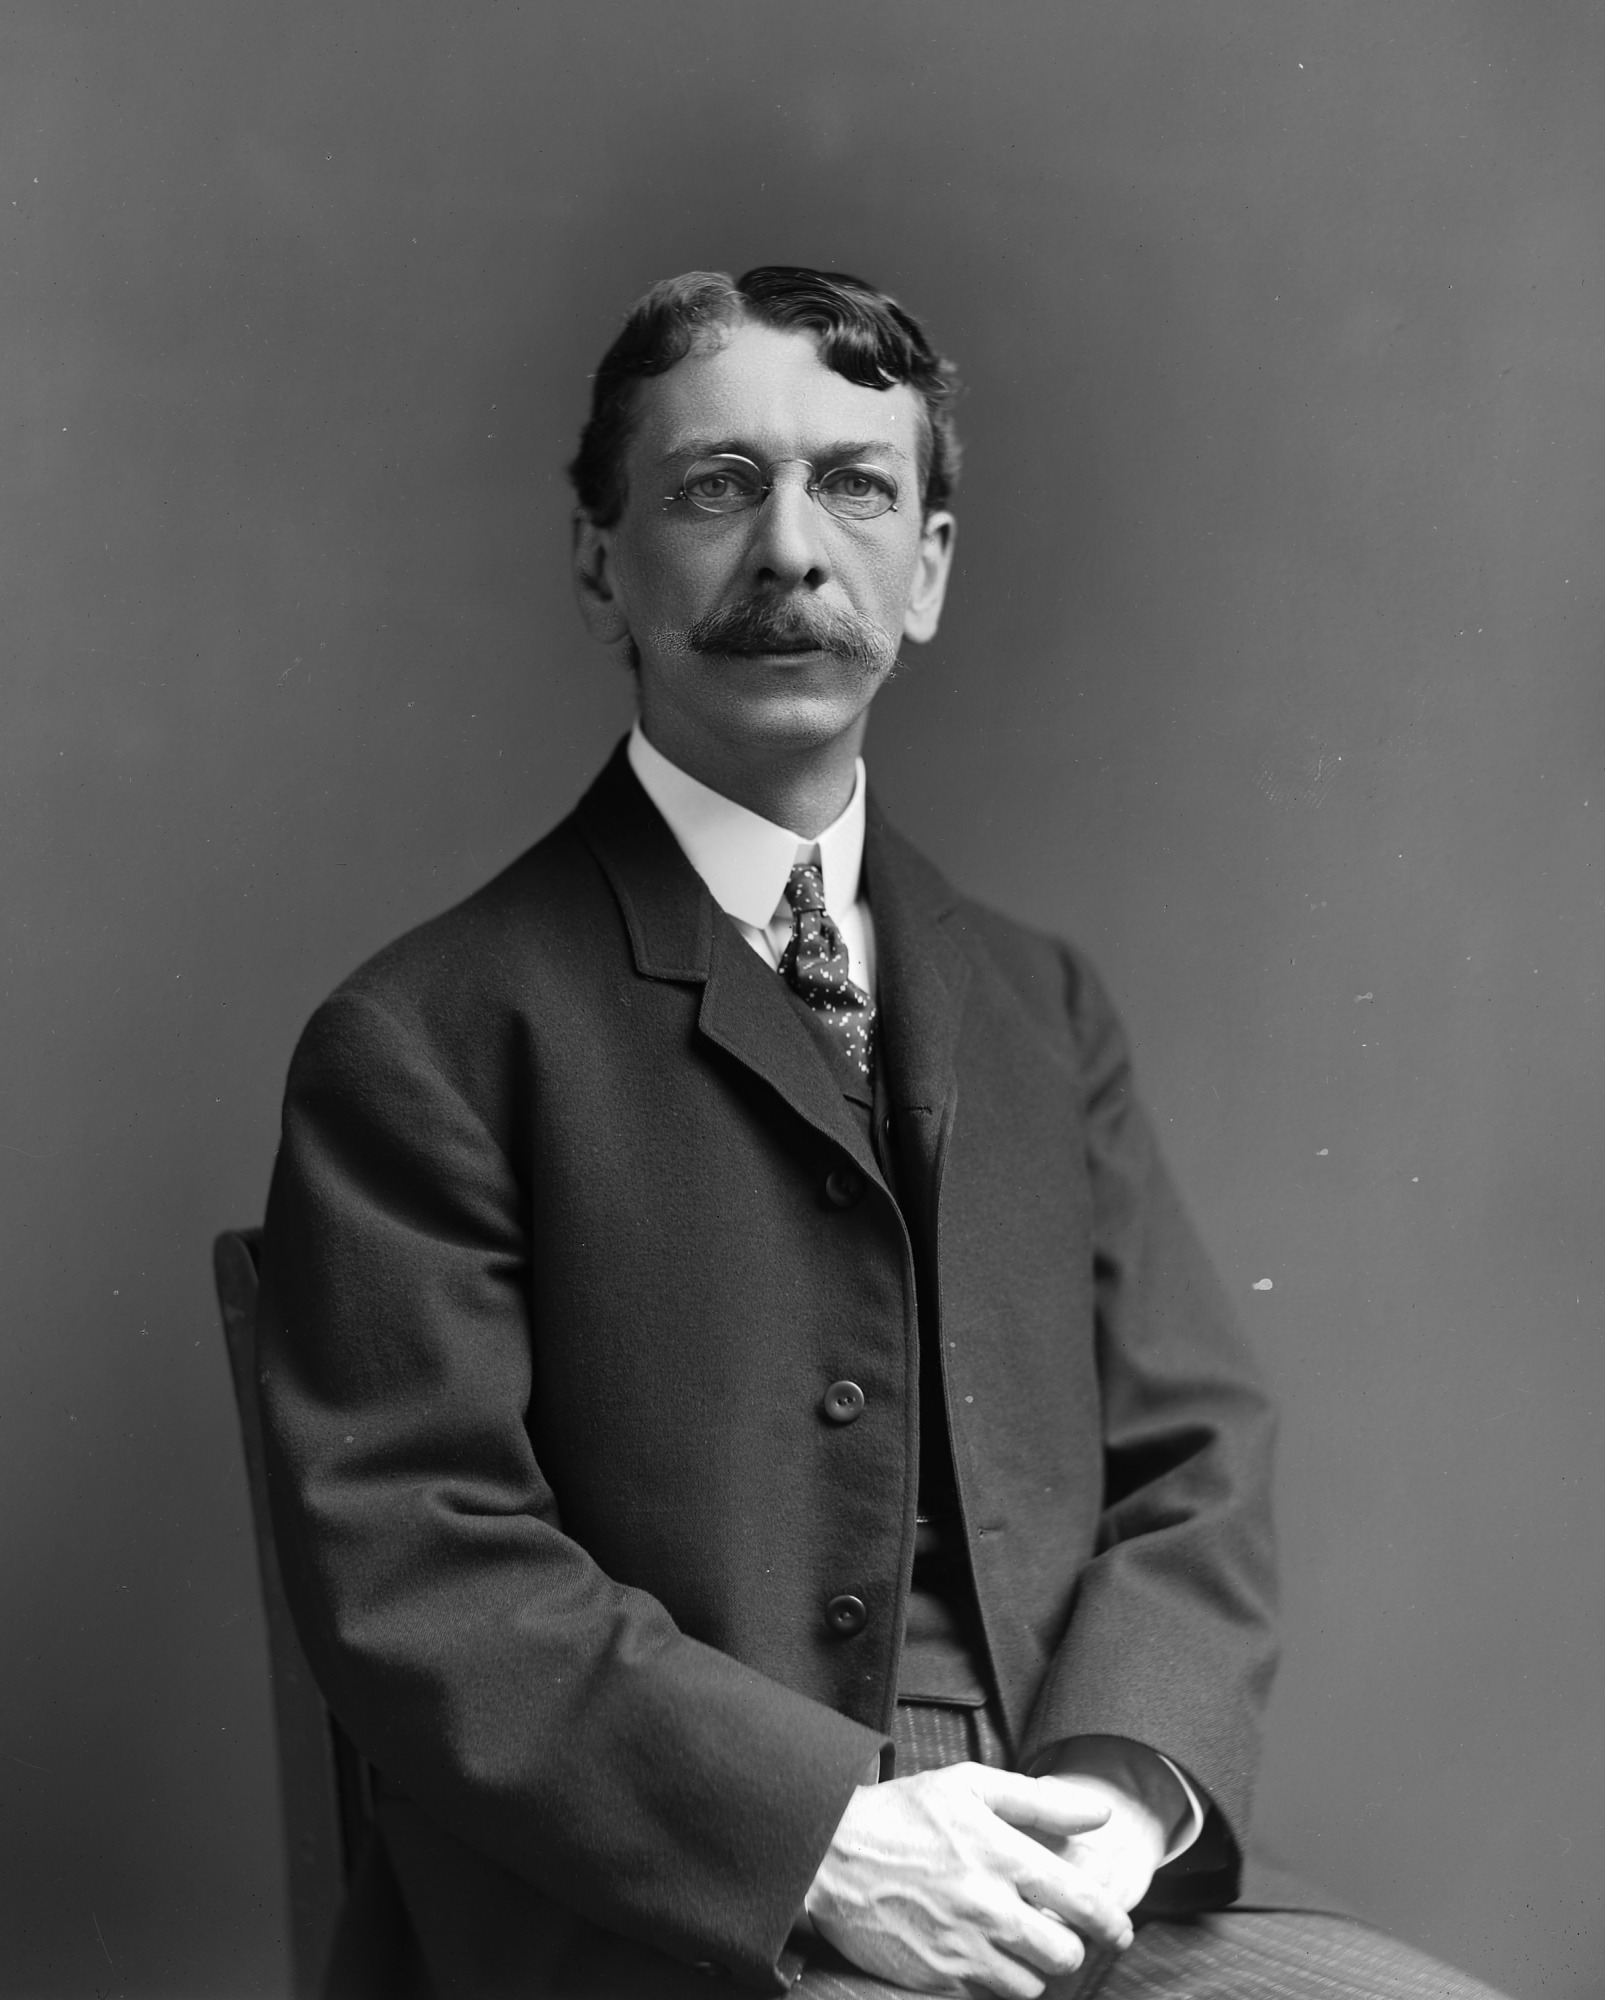 Portrait of Richard Rathbun